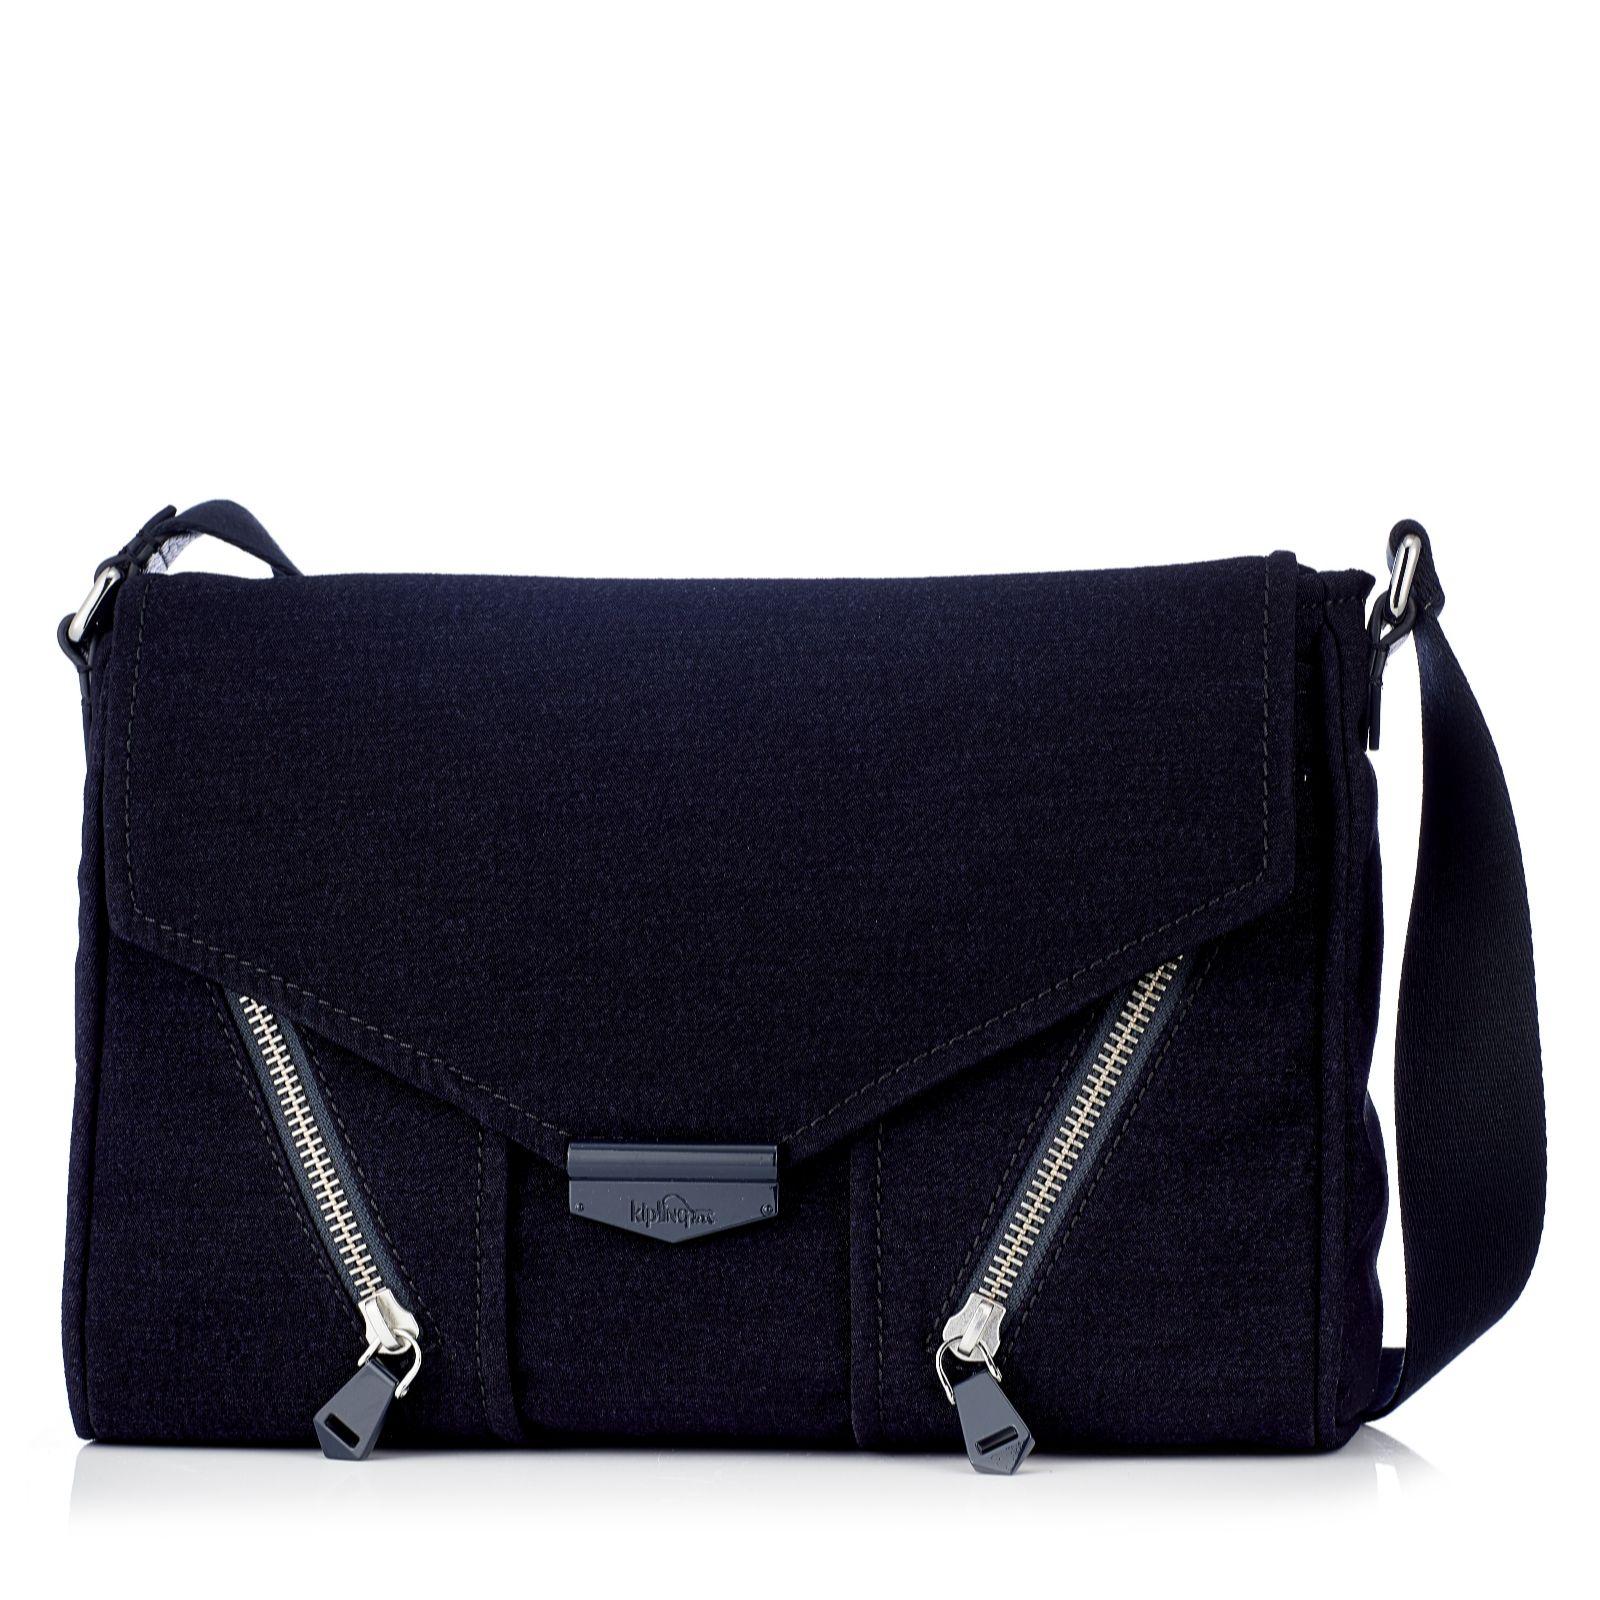 Silver leather tote bag uk - Kipling Kaeon Always There Shoulder Bag 164041